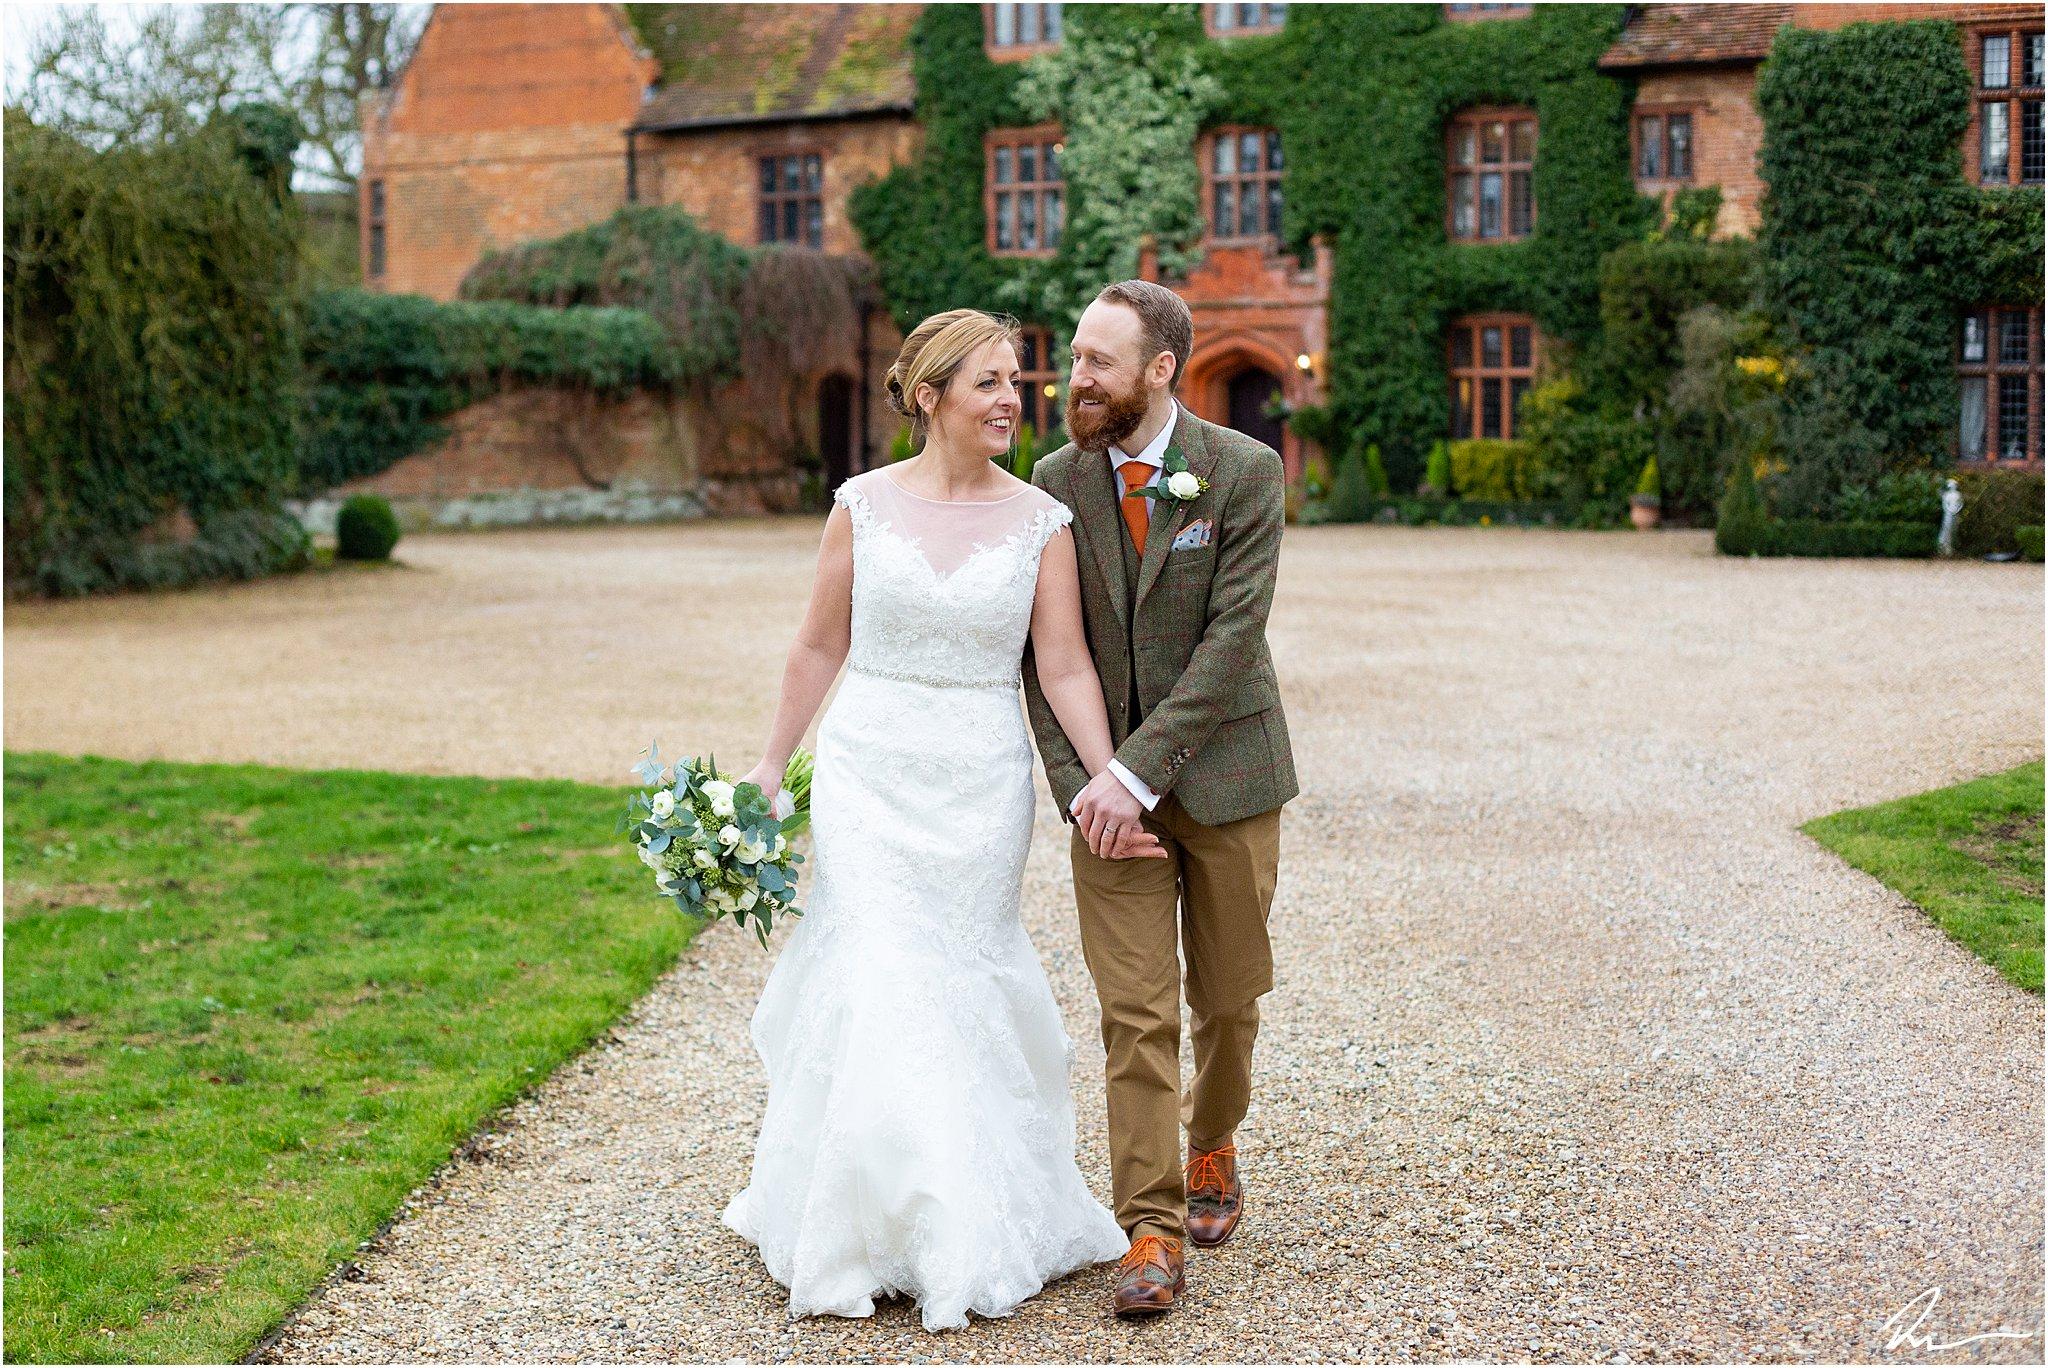 woodhall-manor-wedding-photographer-ross-dean-suffolk-2-web.jpg